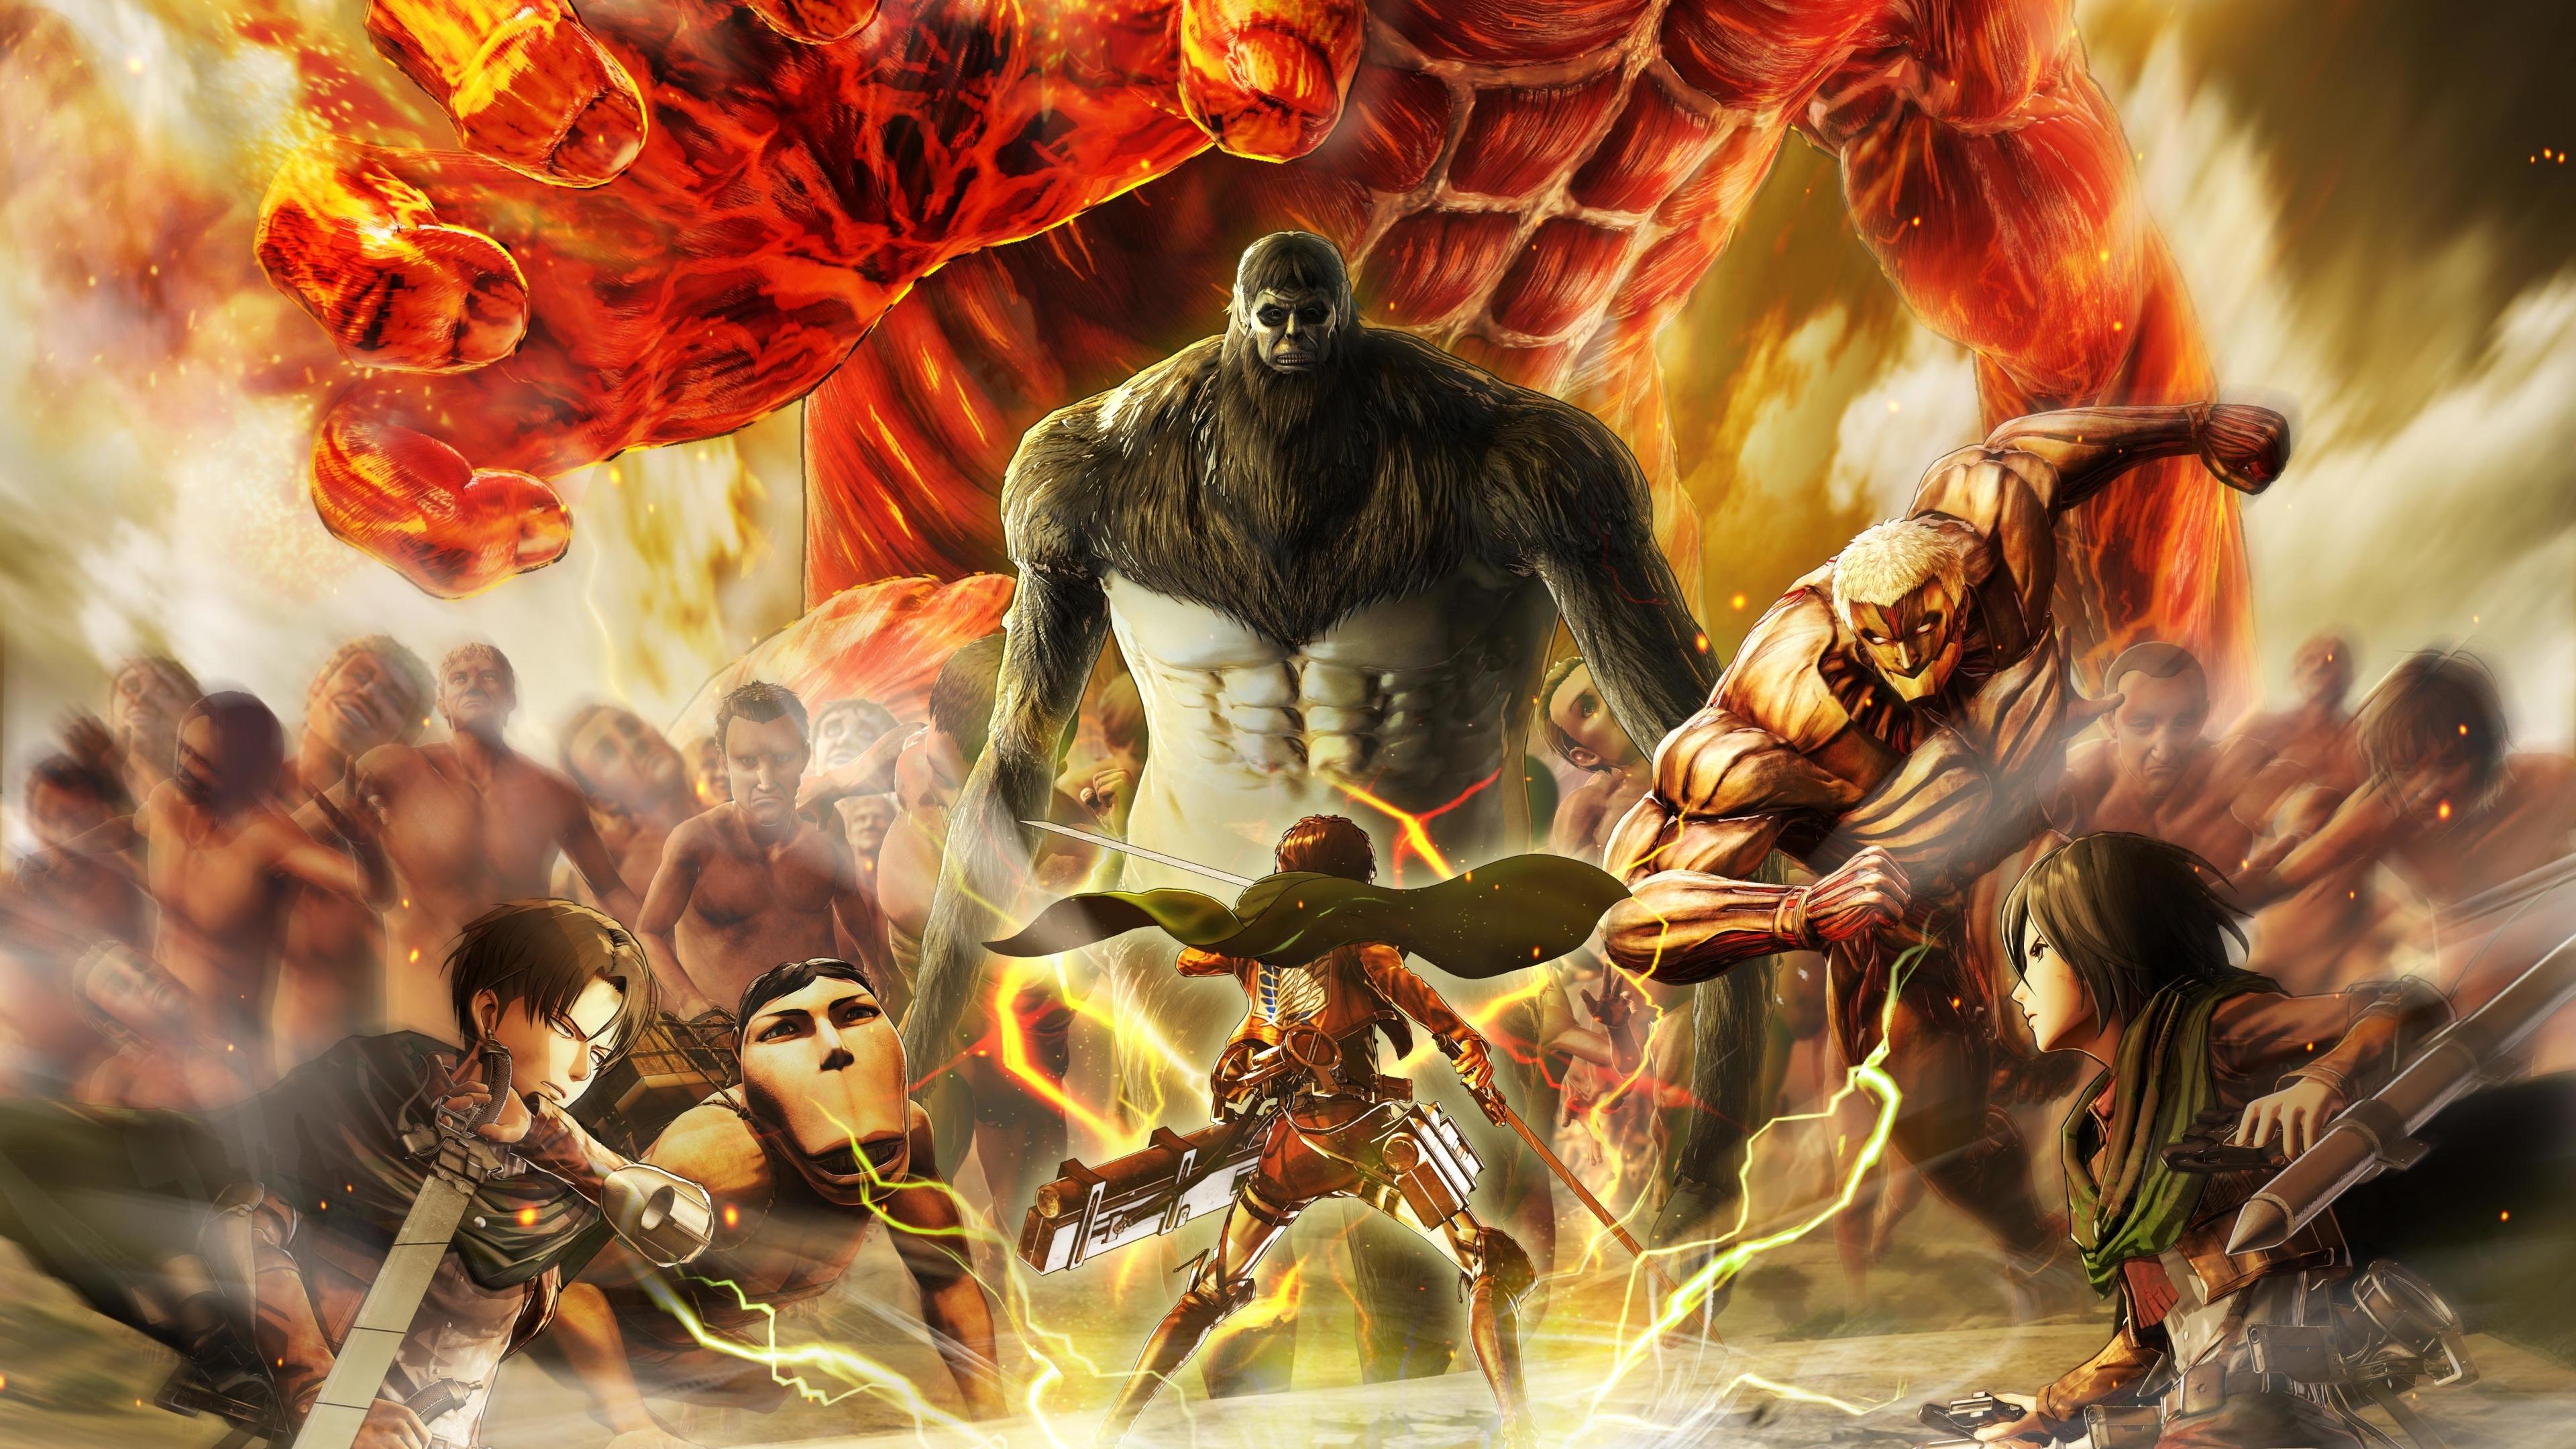 3840x2160 Attack on Titan Final Battle 4K Wallpaper, HD ...